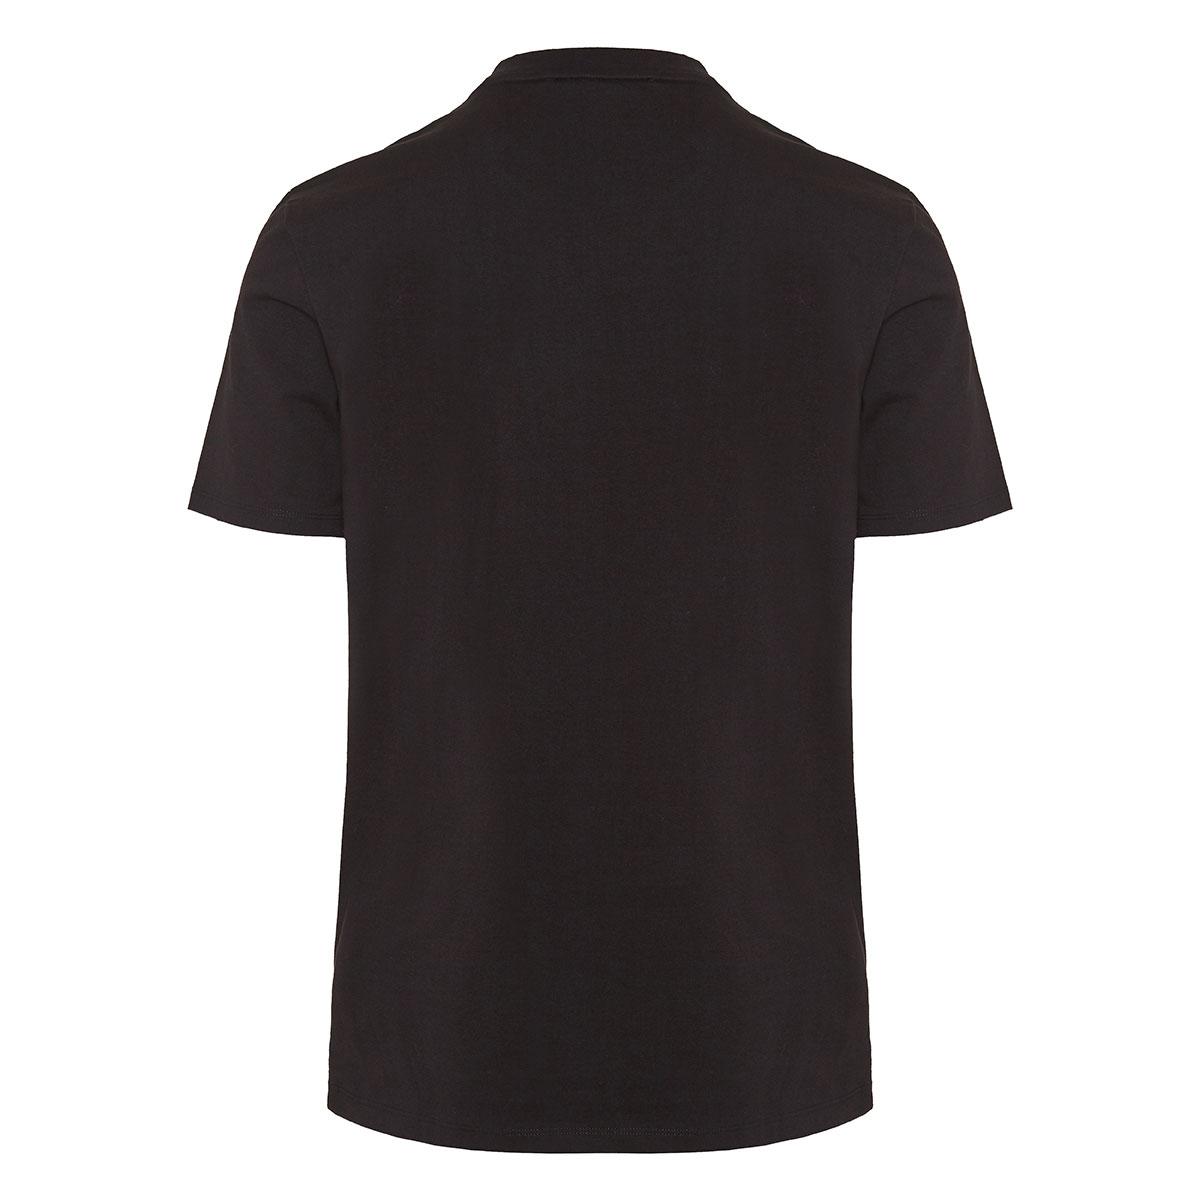 Glow-in-the-dark logo t-shirt